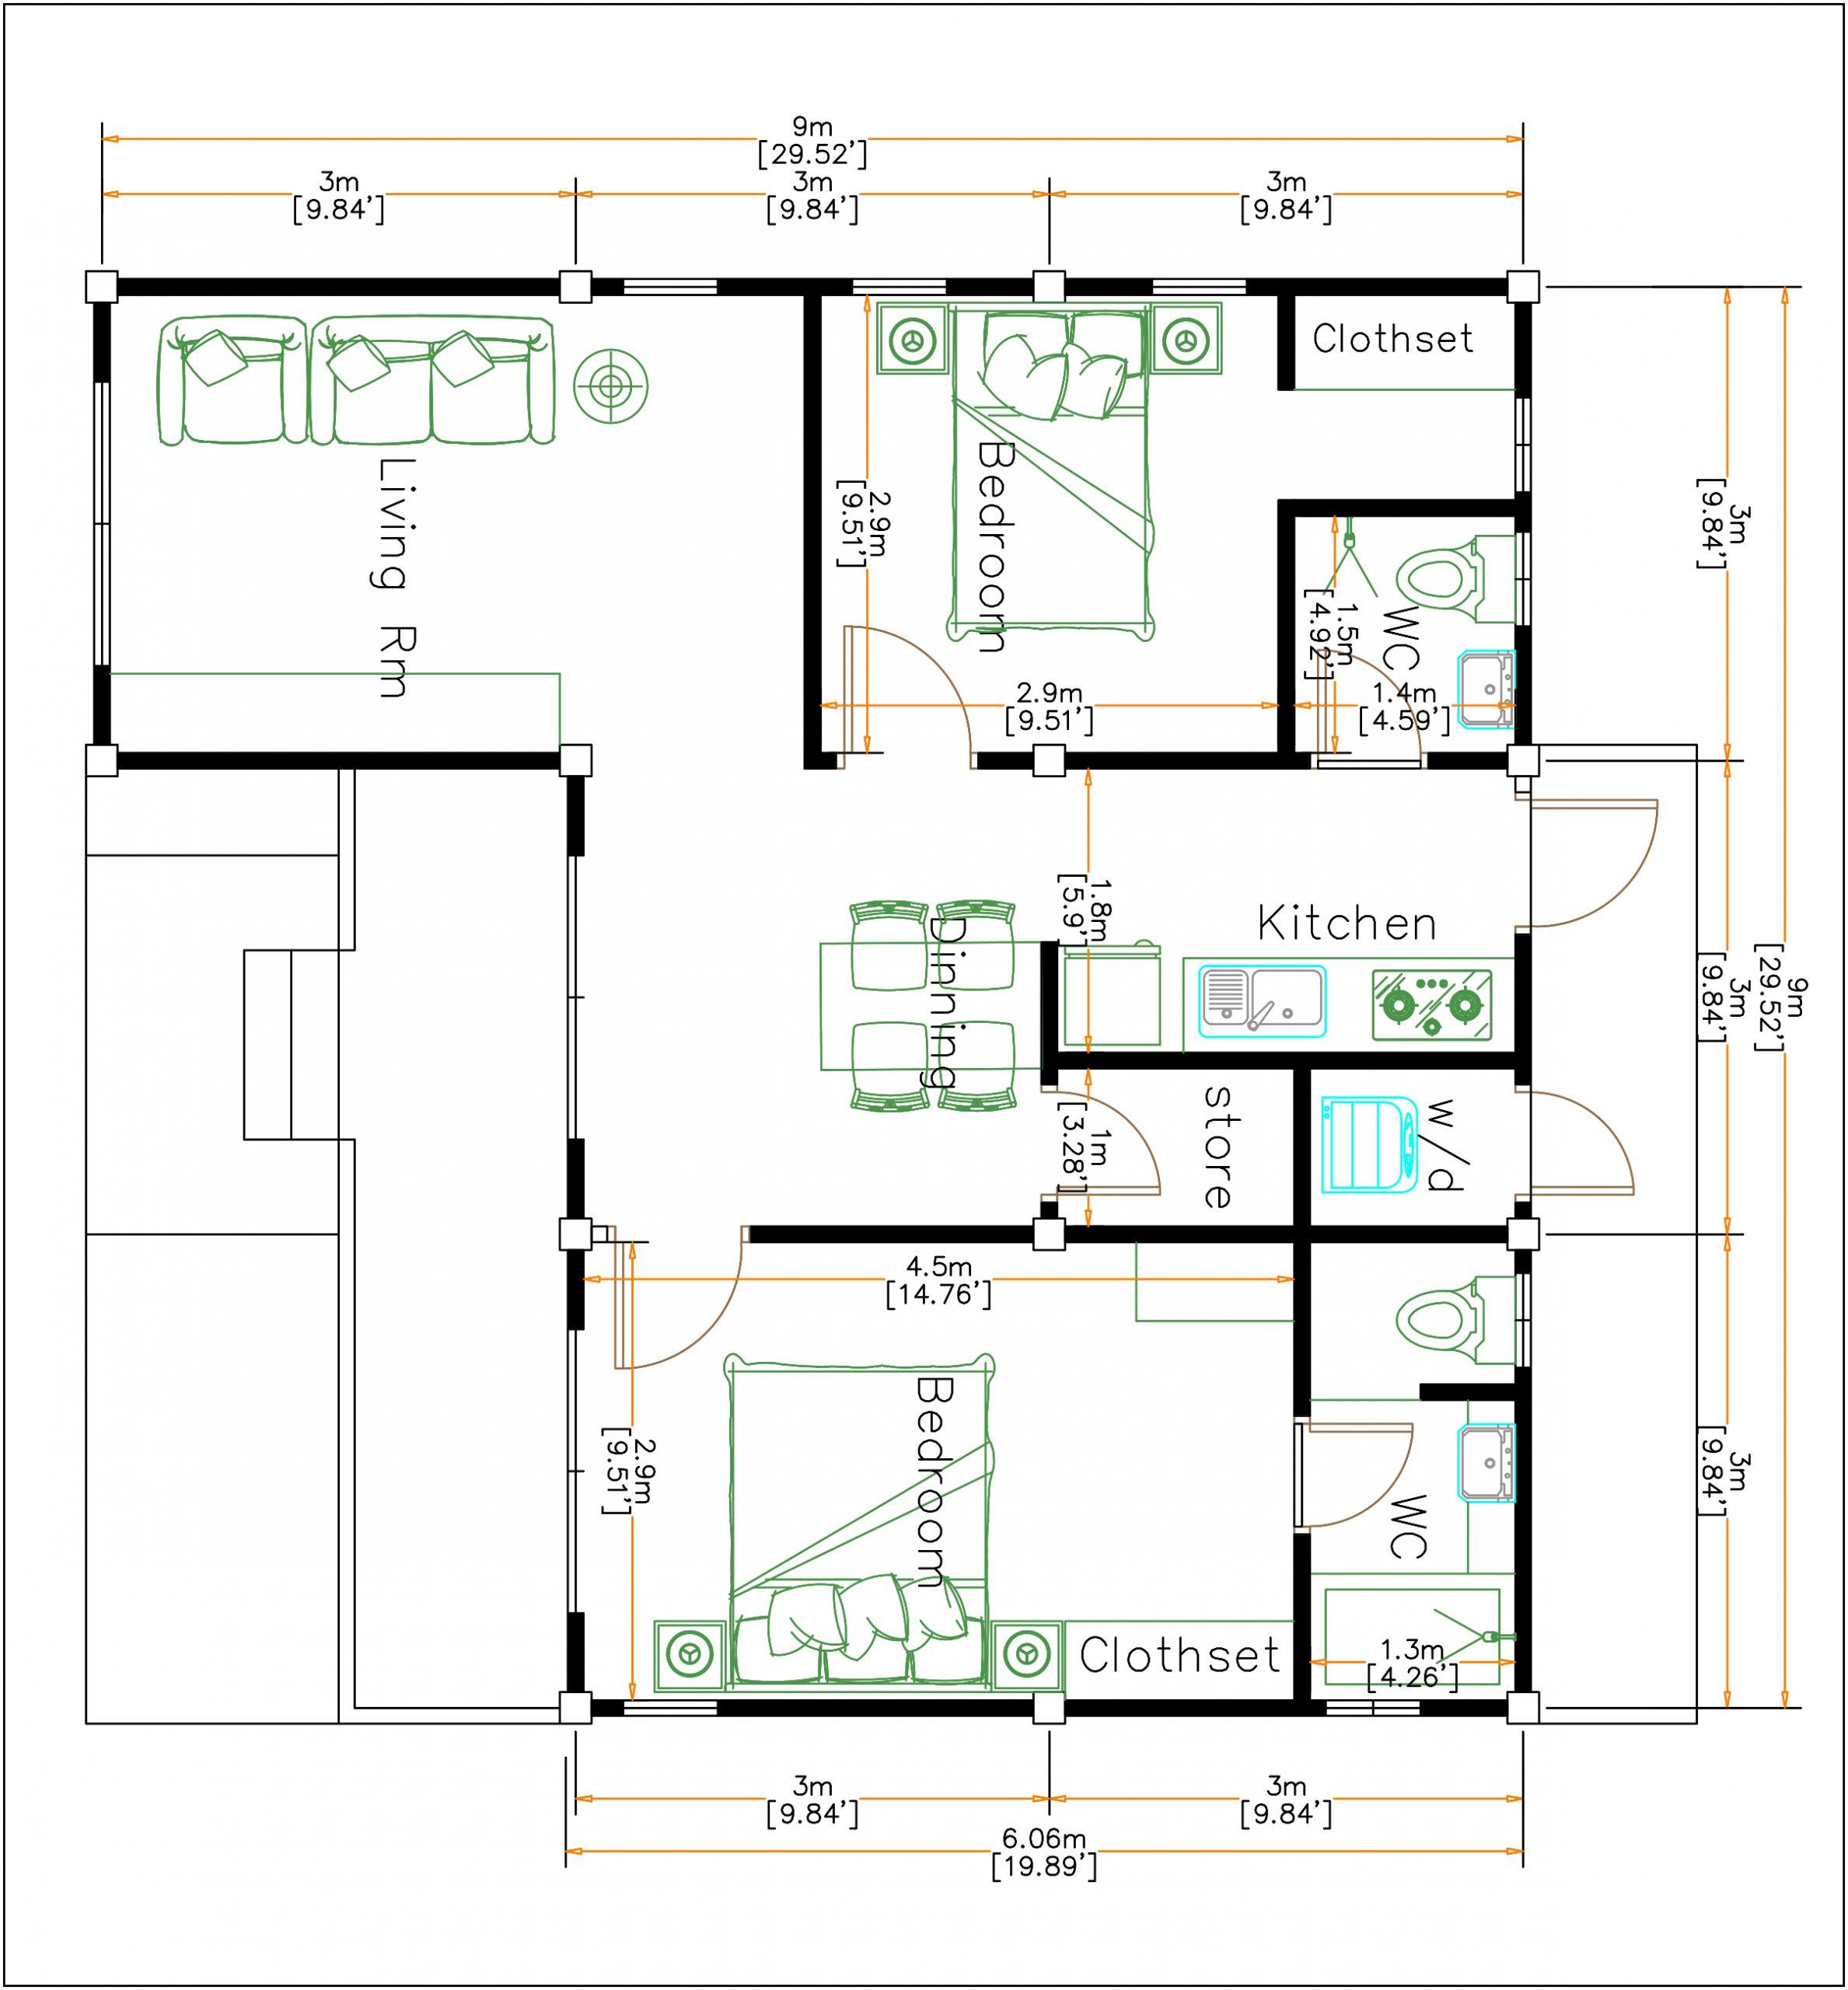 Exterior Home Design 9x9 Meters 30x30 Feet 2 Beds House layout floor plan